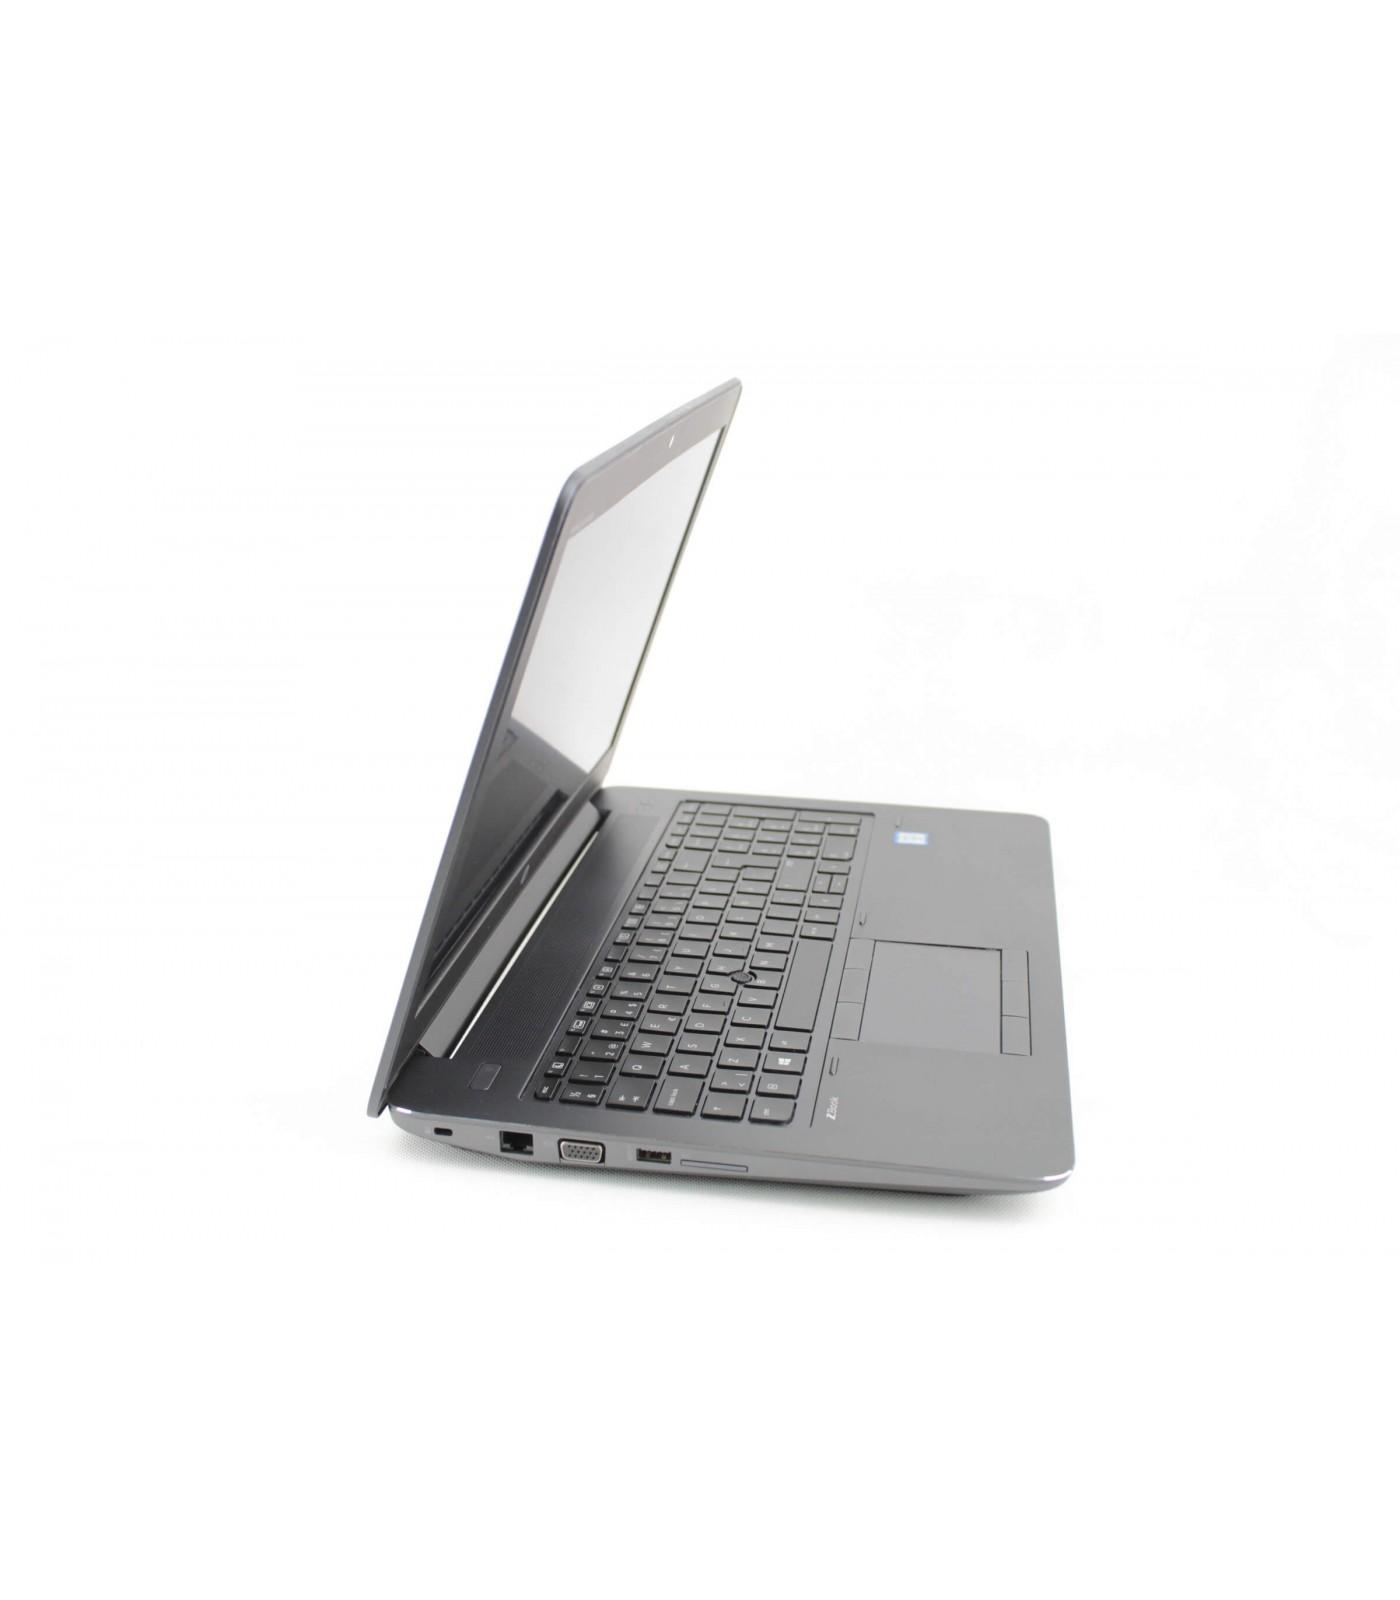 Poleasingowy laptop HP Zbook 15 G3 z Intel Core i7-6820HQ i kartą graficzną Nvidia Quadro M2000M, Klasa A+